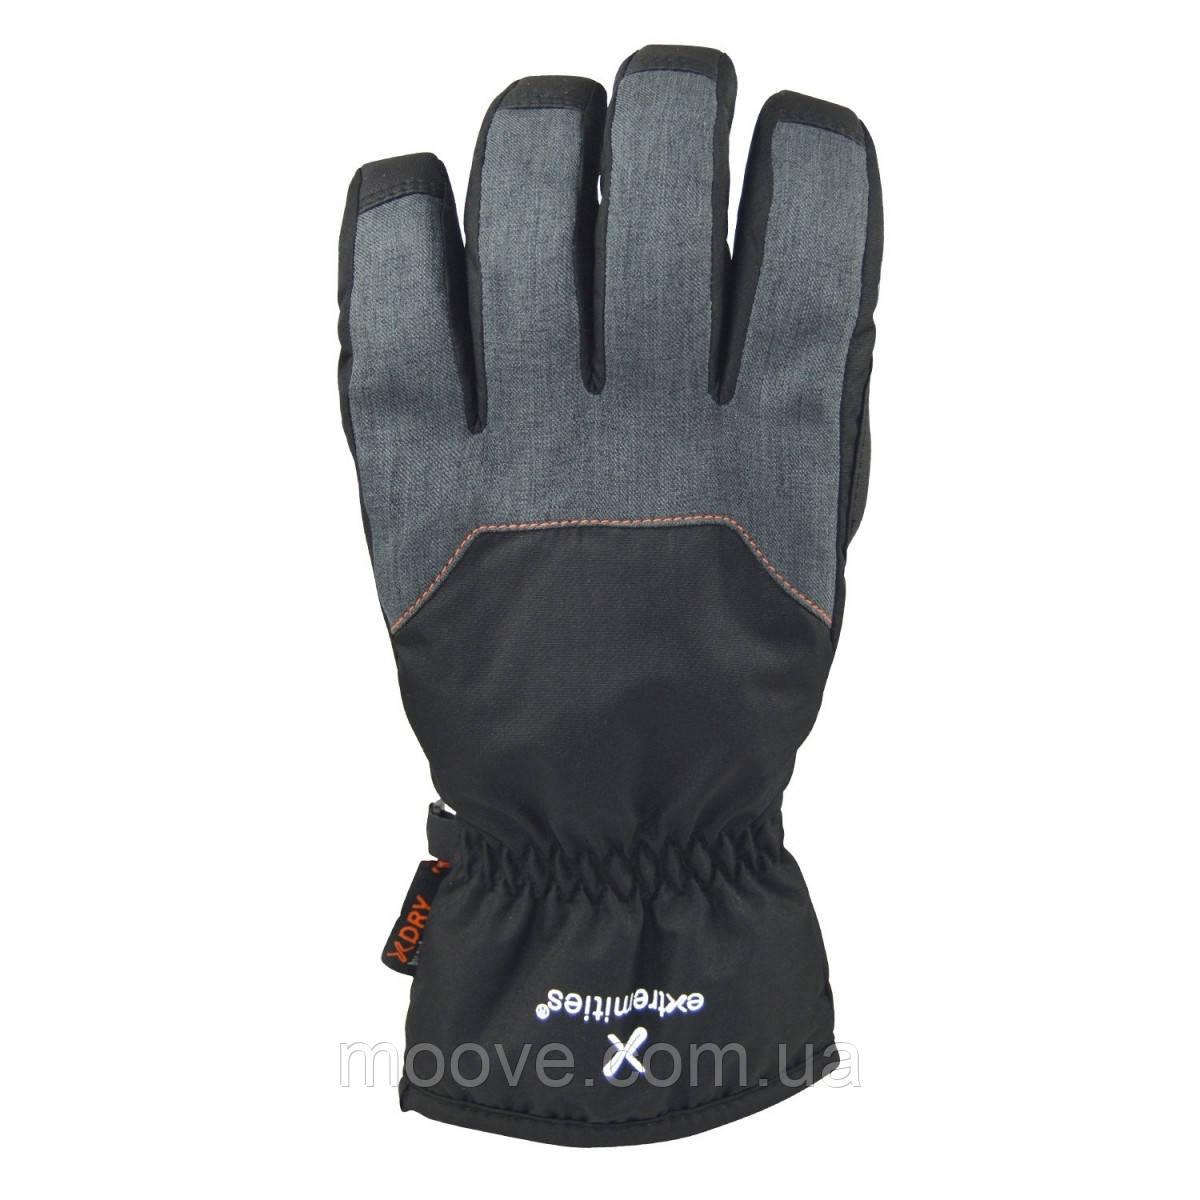 Extremities Douglas Peak Glove M grey/black